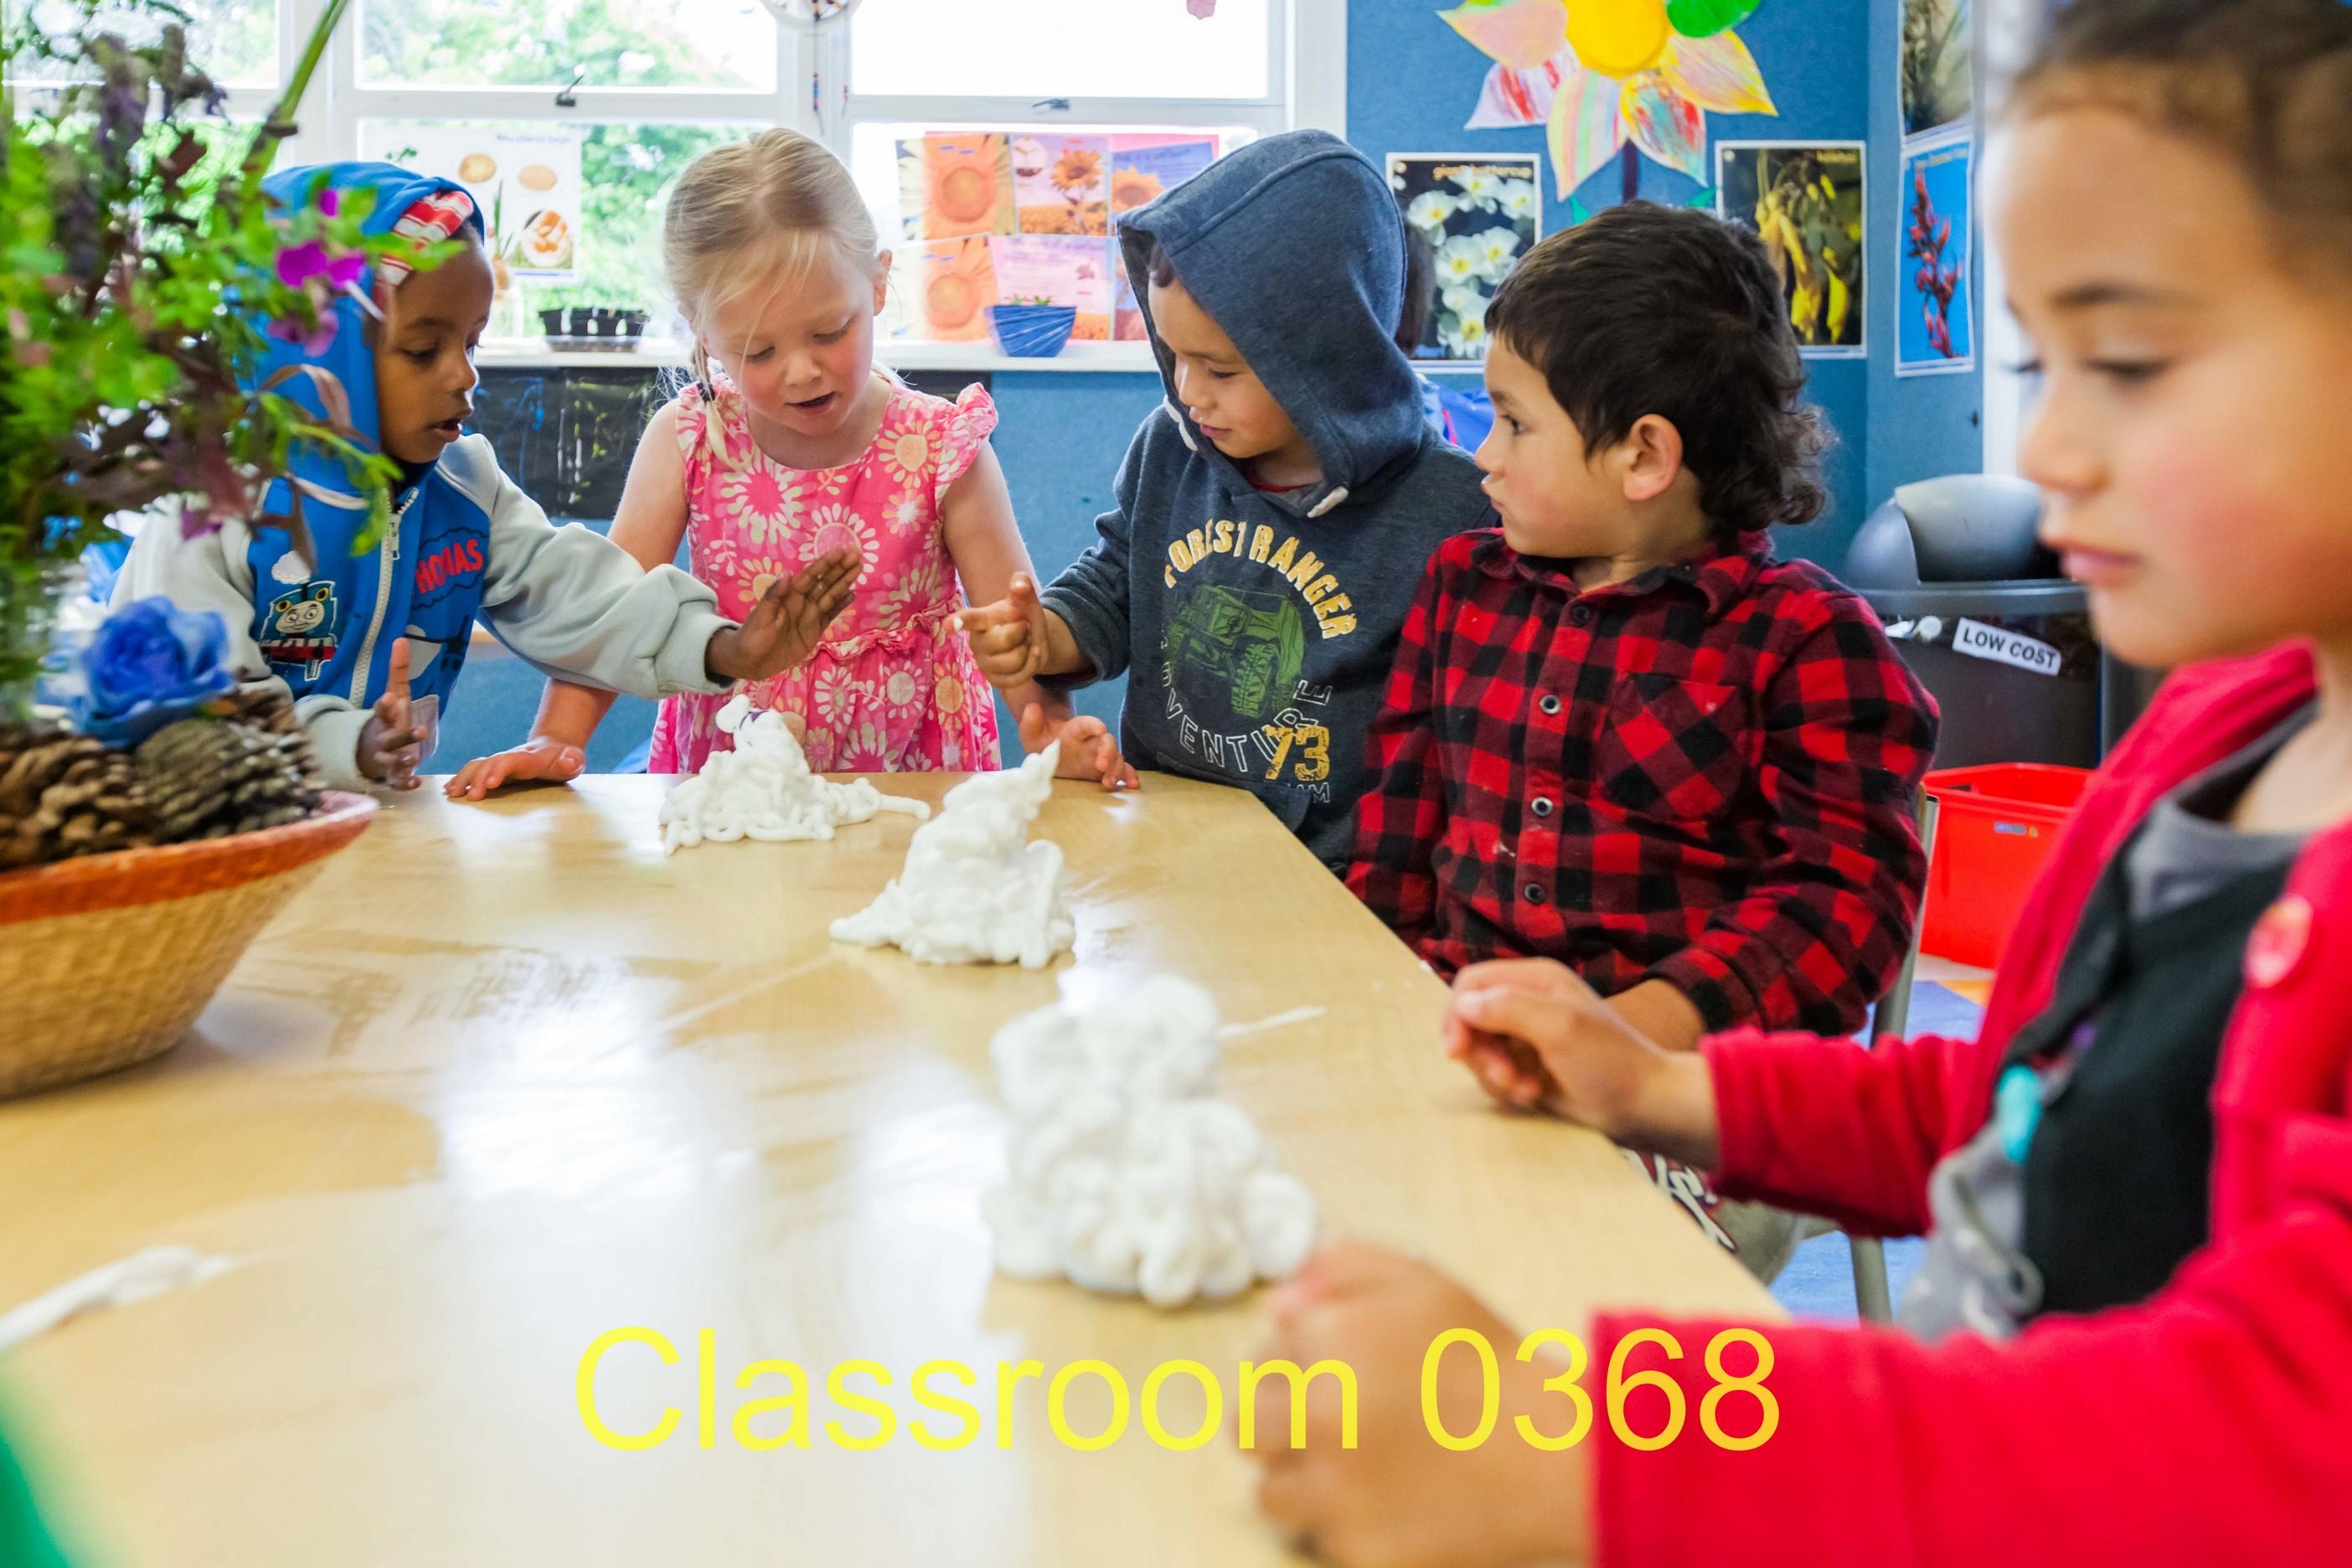 Classroom 0368